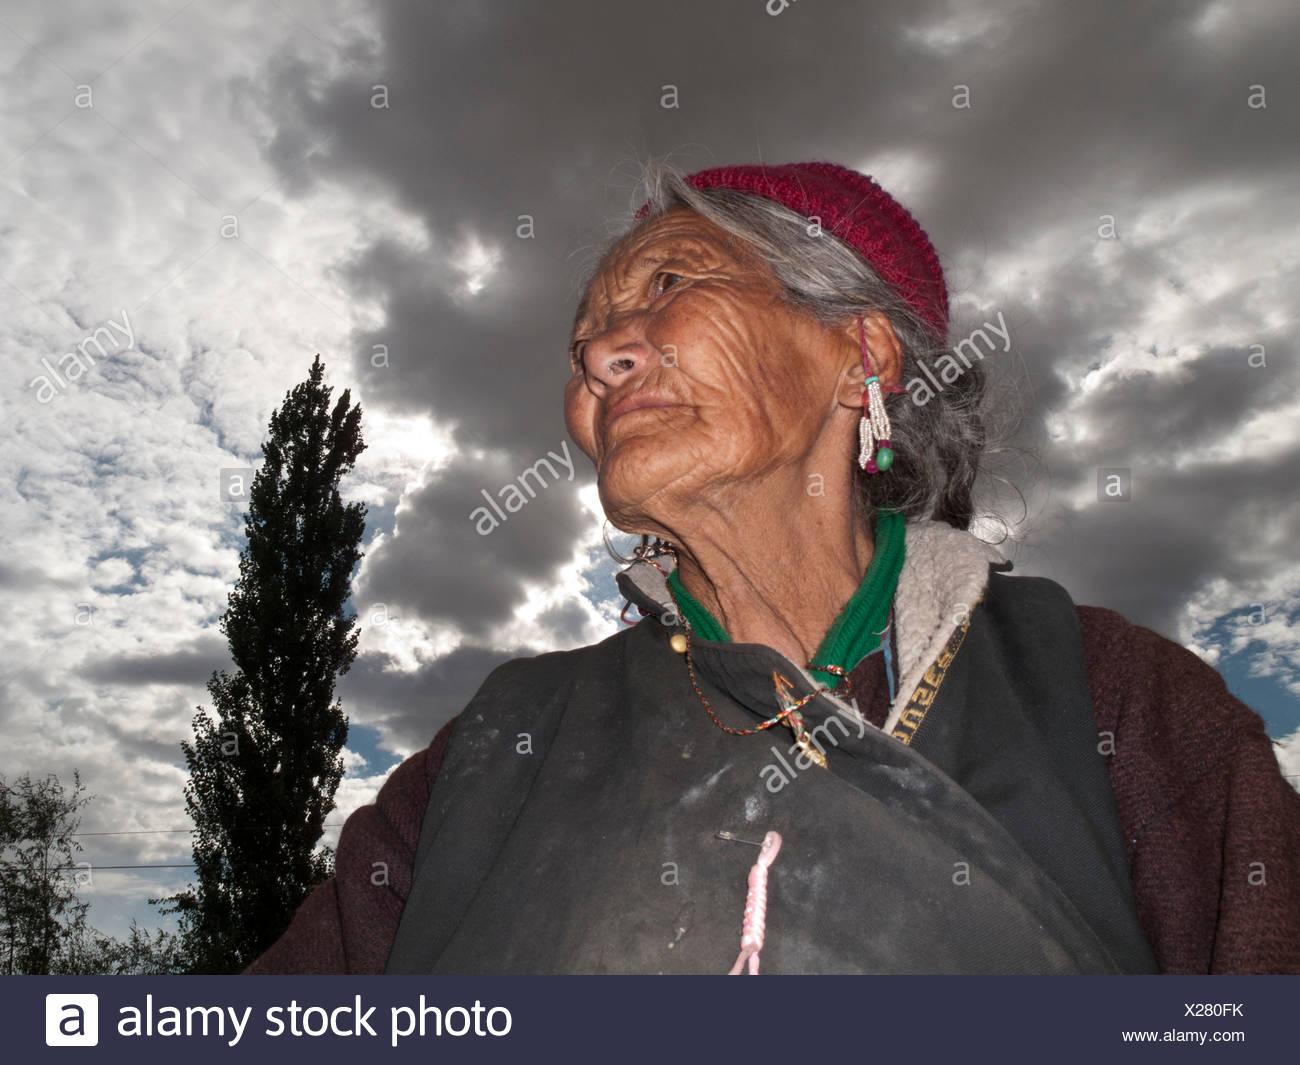 Ladakhi woman, looking sorrowful, Lamayuru, Jammu and Kashmir, India, Asia - Stock Image